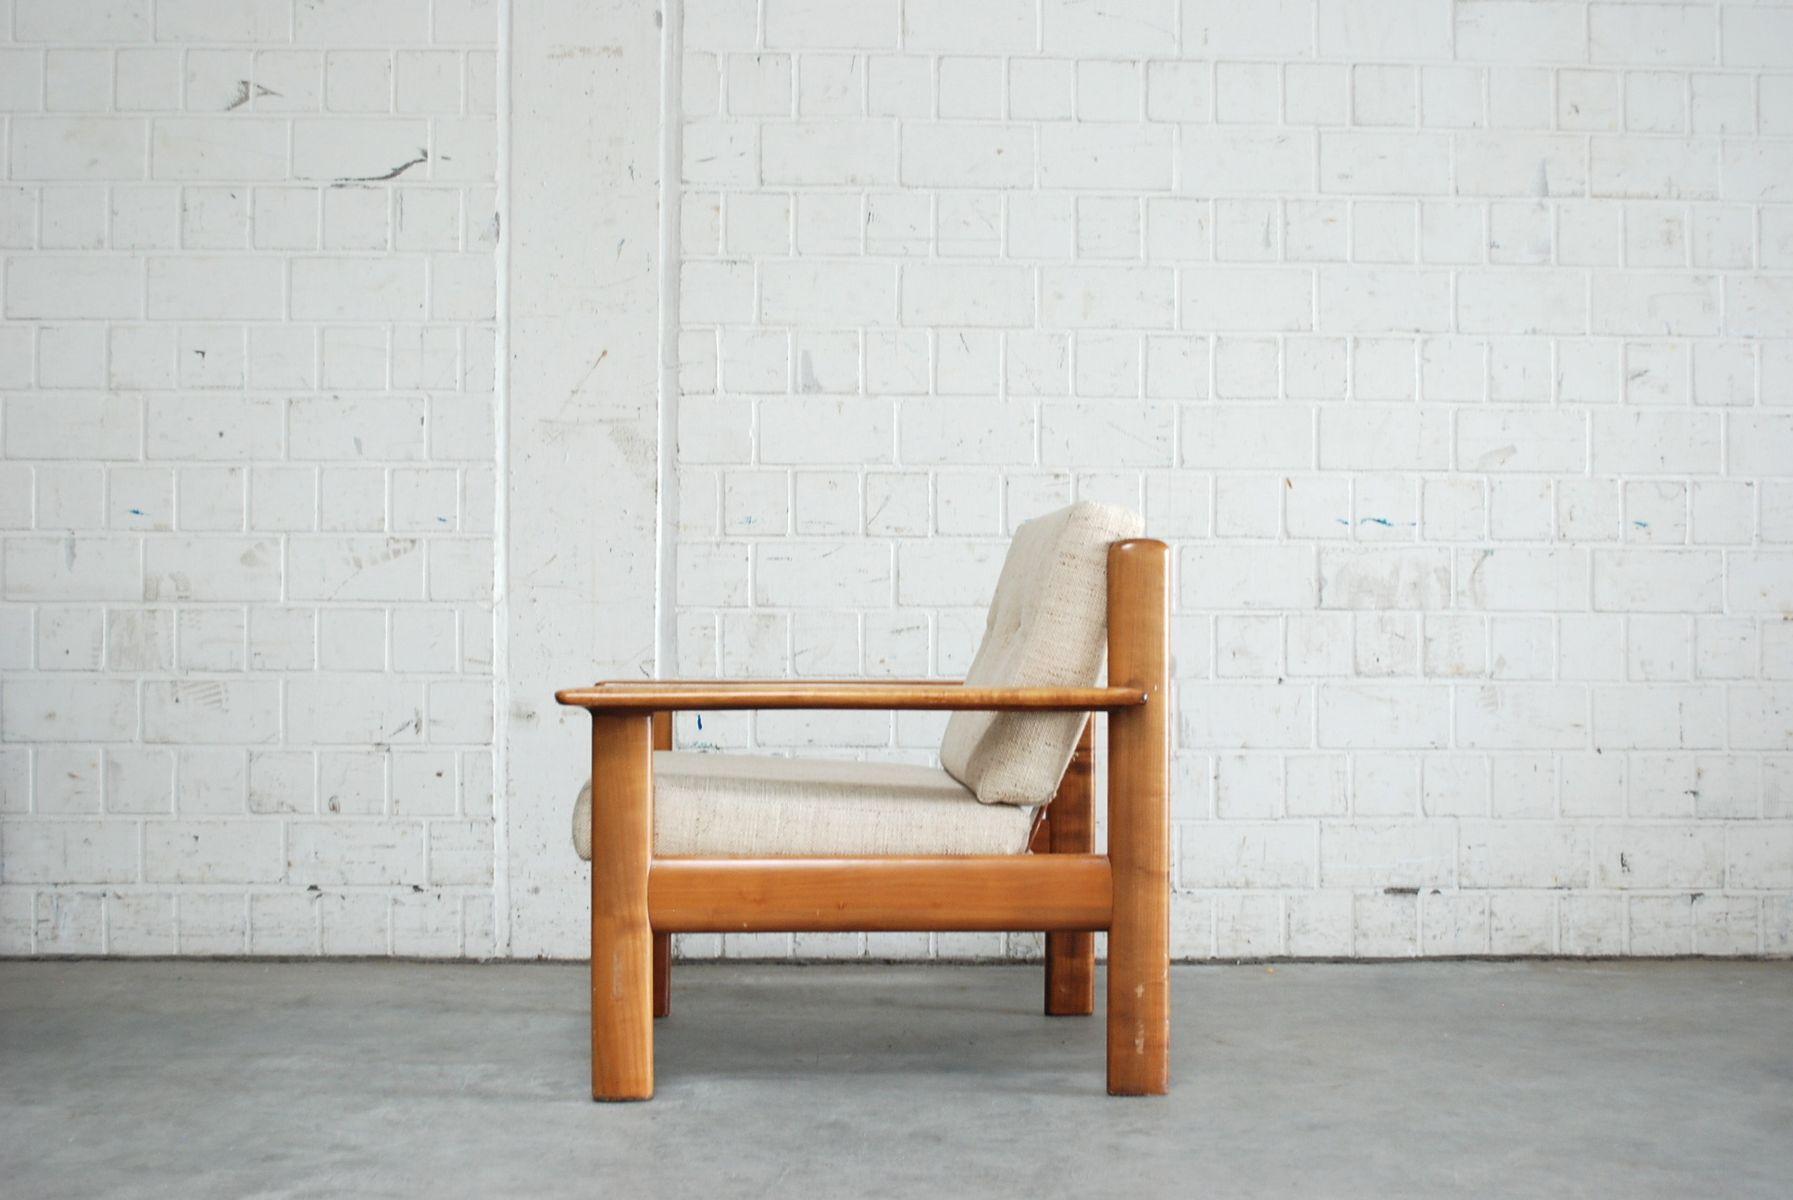 vintage sessel aus kirschholz von knoll bei pamono kaufen. Black Bedroom Furniture Sets. Home Design Ideas